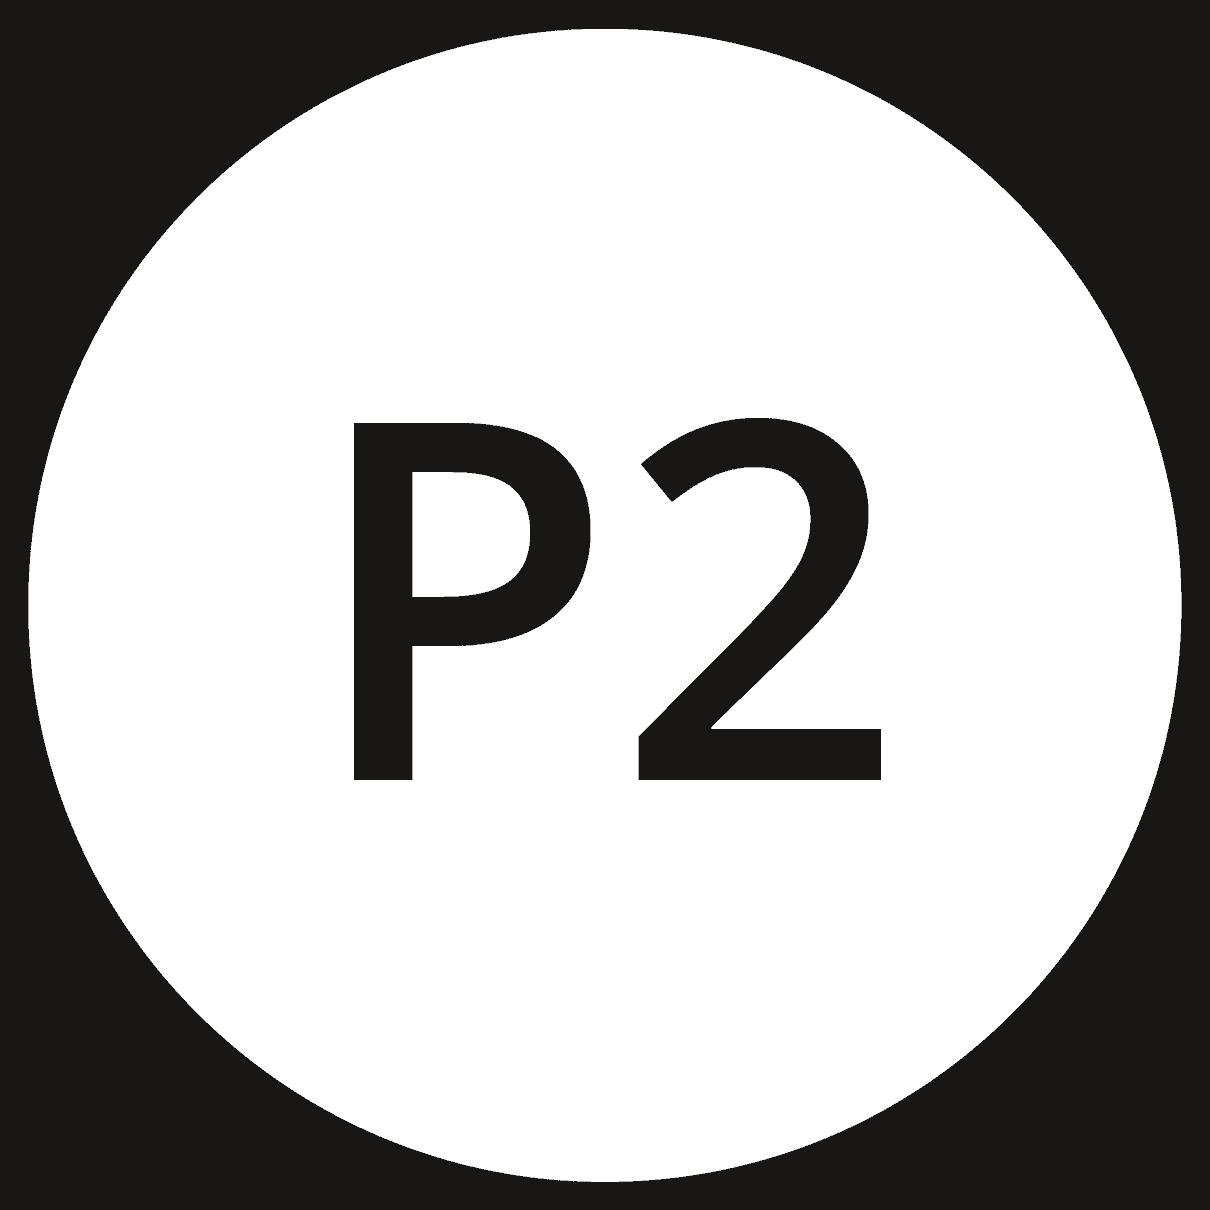 Icon Phase 2